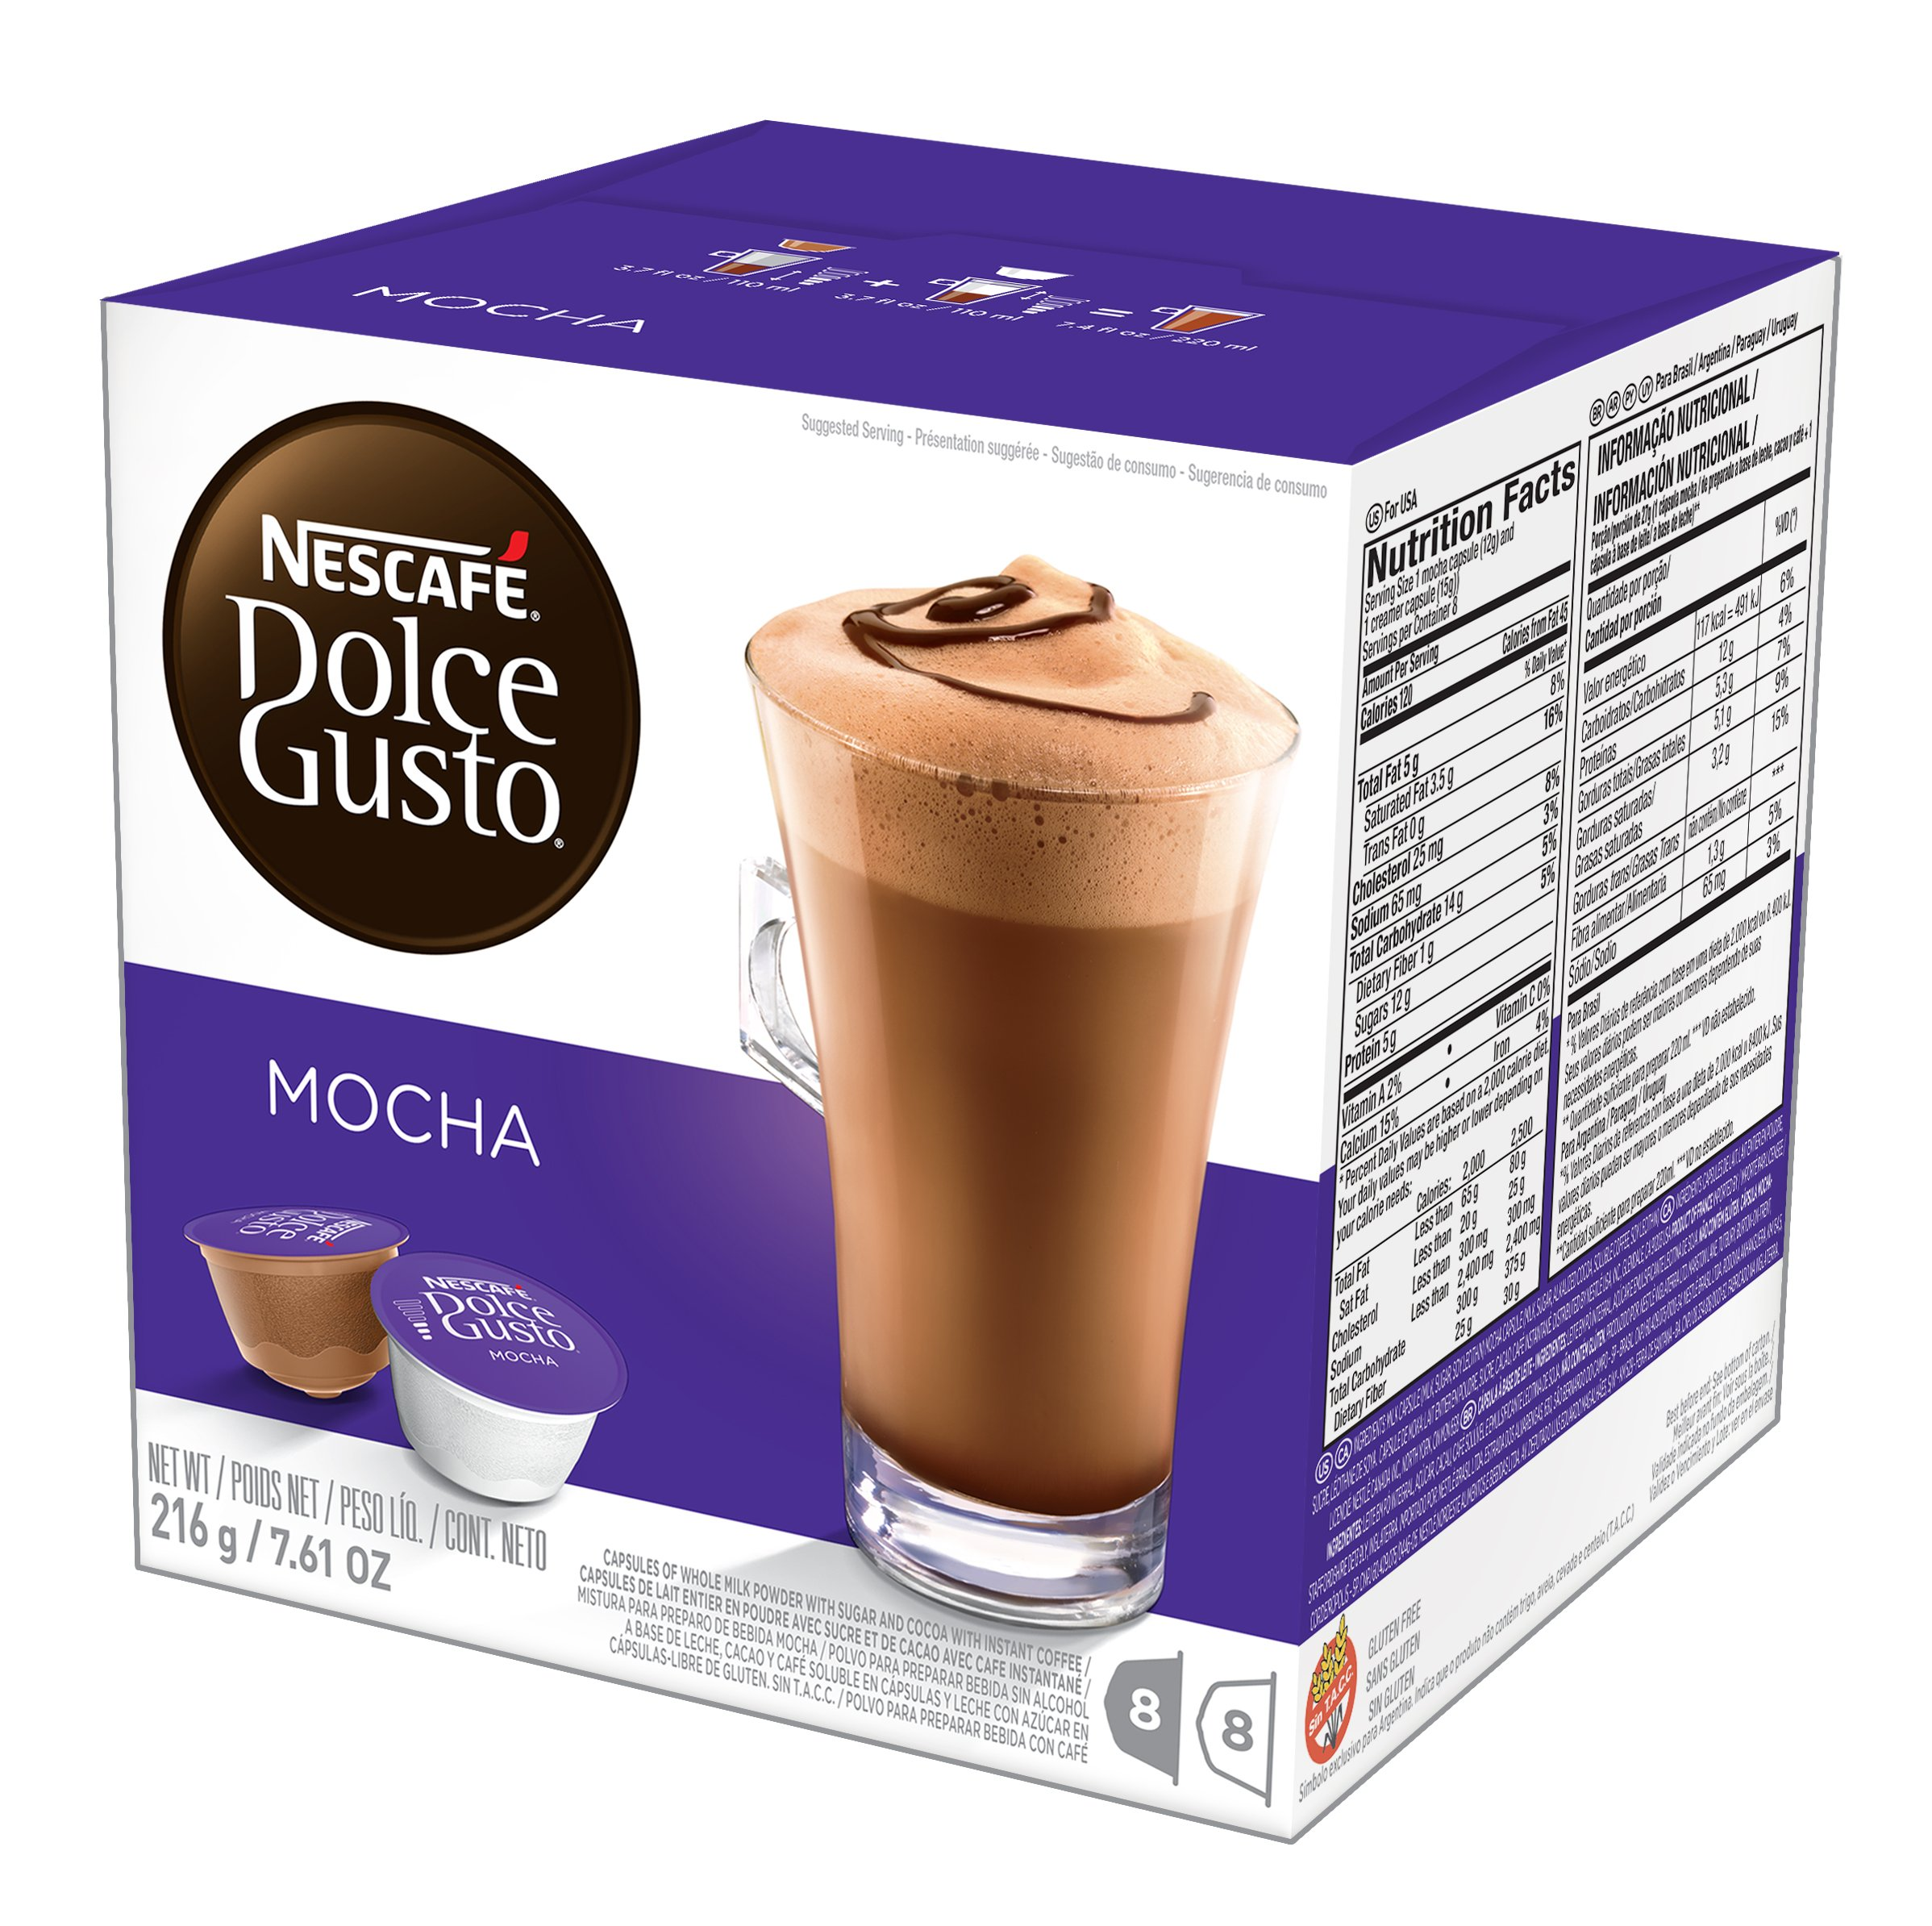 NESCAFÉ Dolce Gusto Coffee Capsules Mocha 48 Single Serve Pods, (Makes 24 Specialty Cups